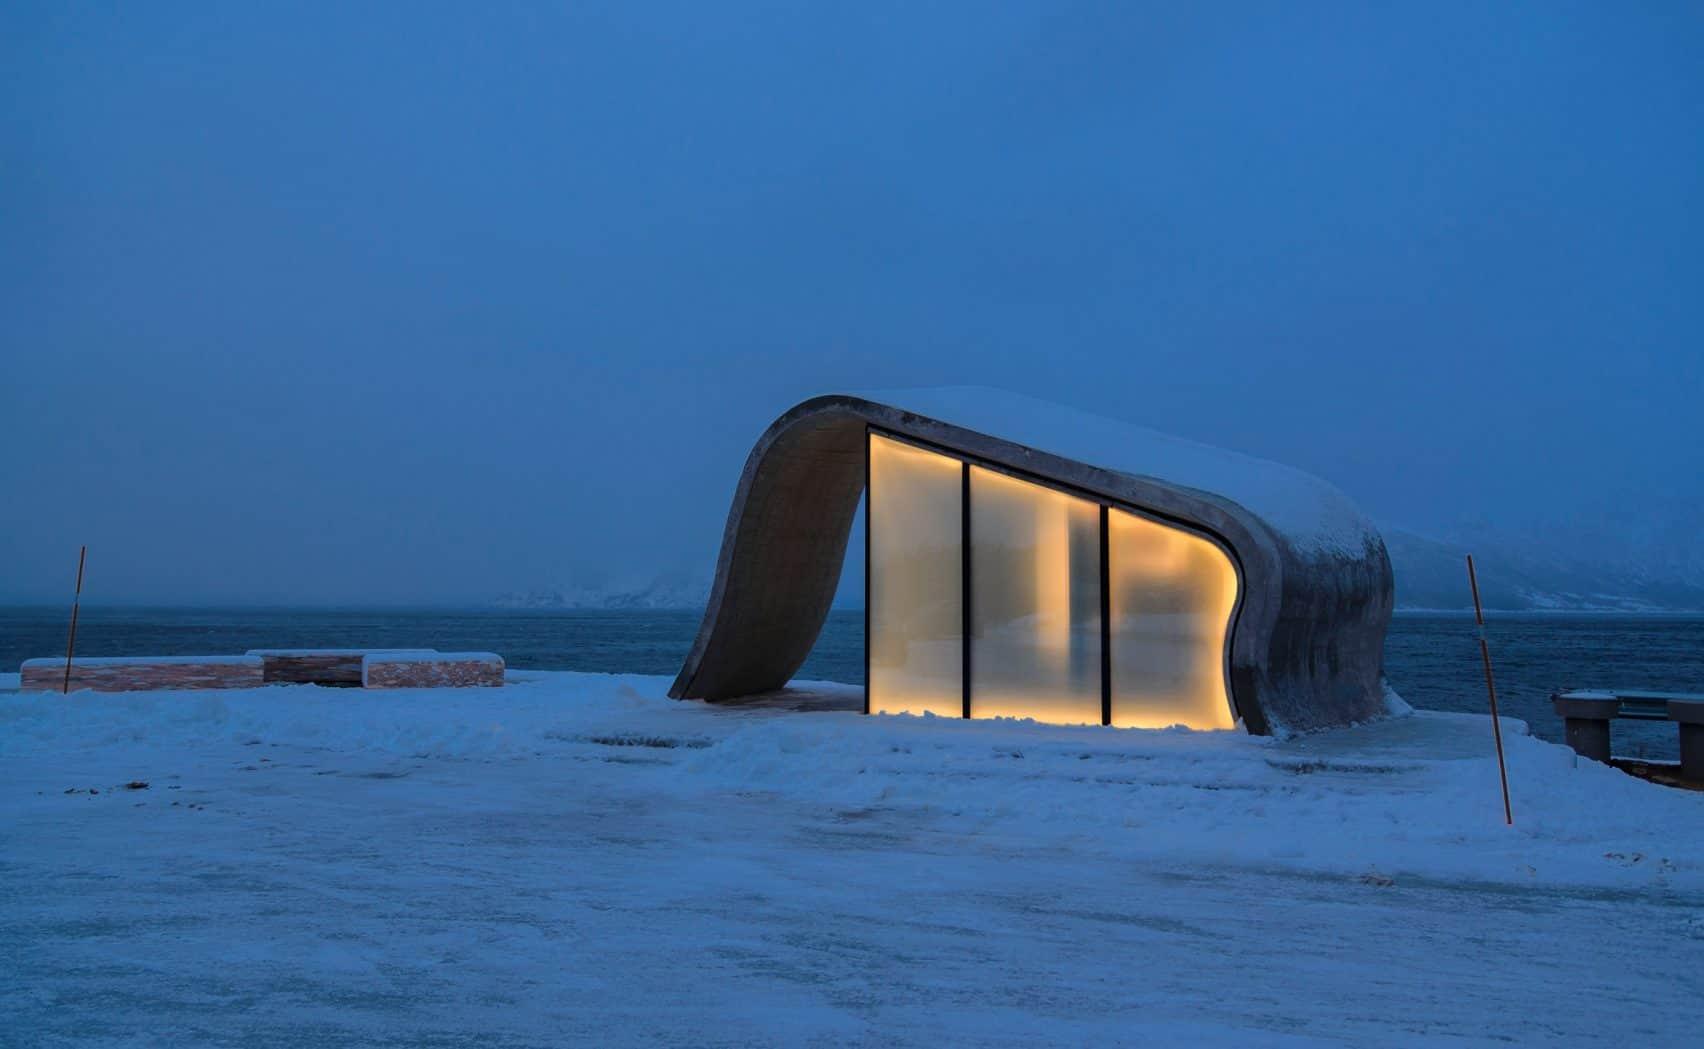 haugen zohar arkitekter hza wave shaped toilet facility norwegian scenic route 4